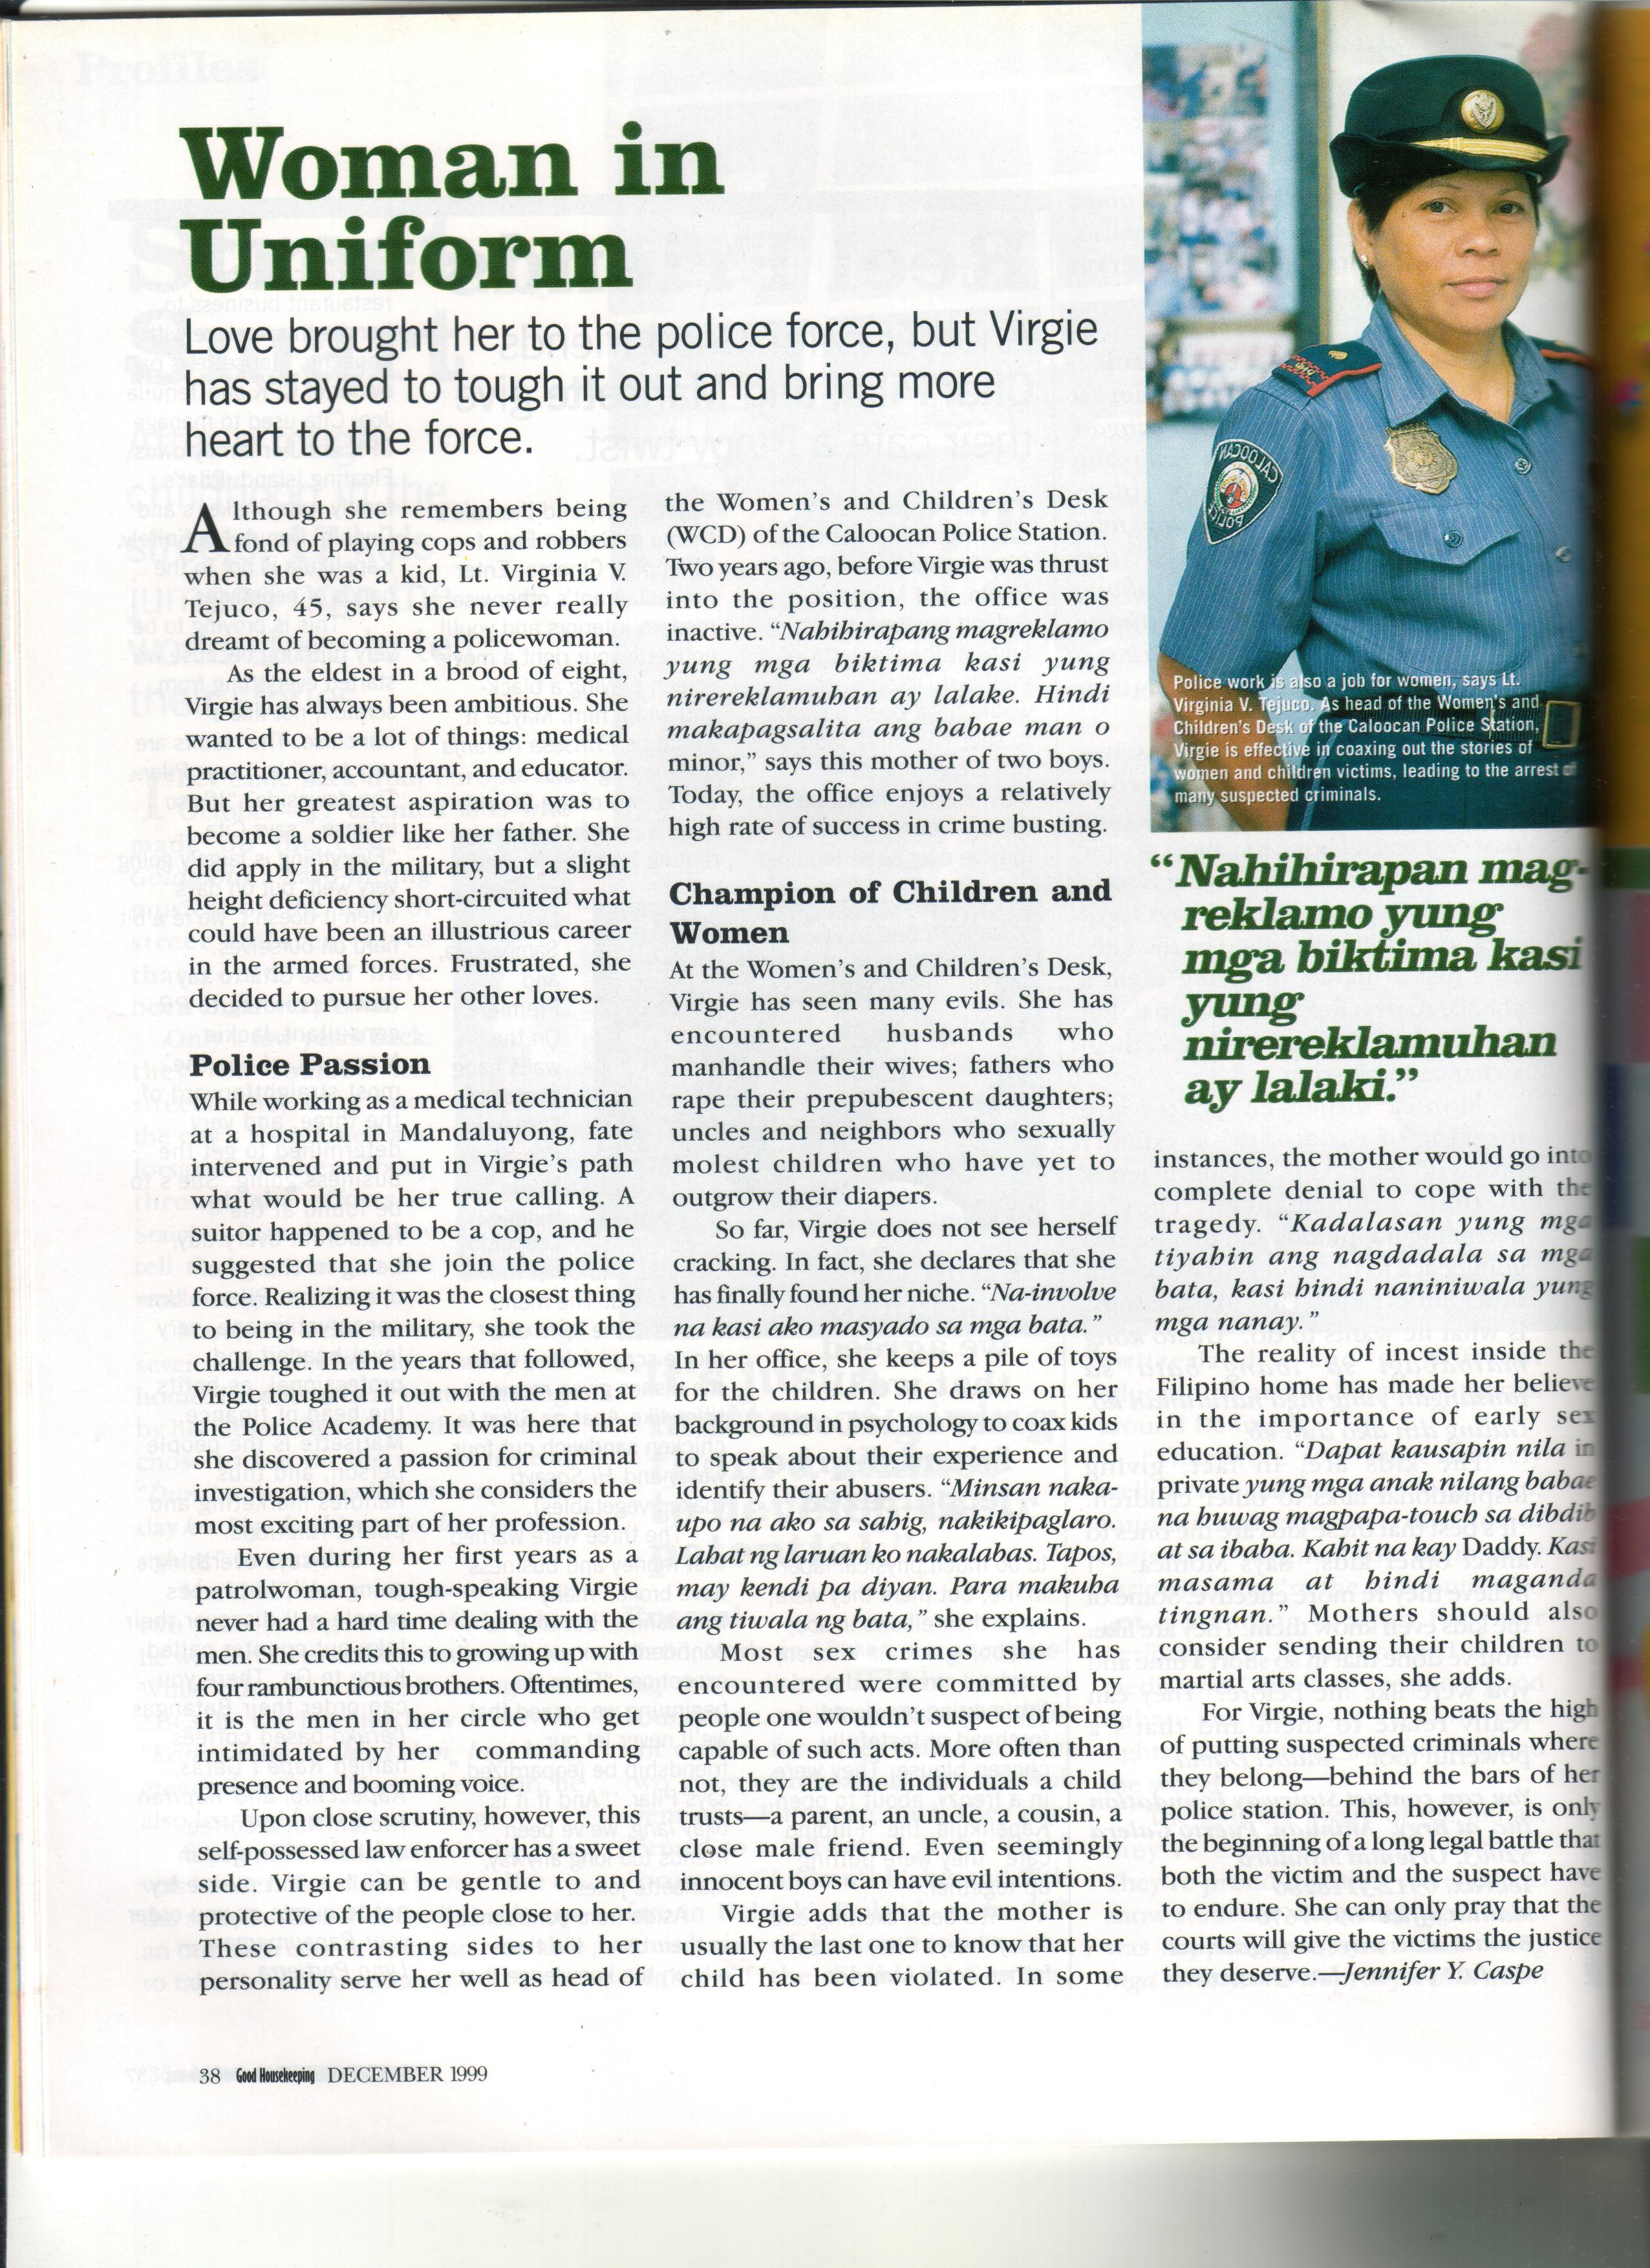 Good Housekeeping Magazine: Woman in Uniform